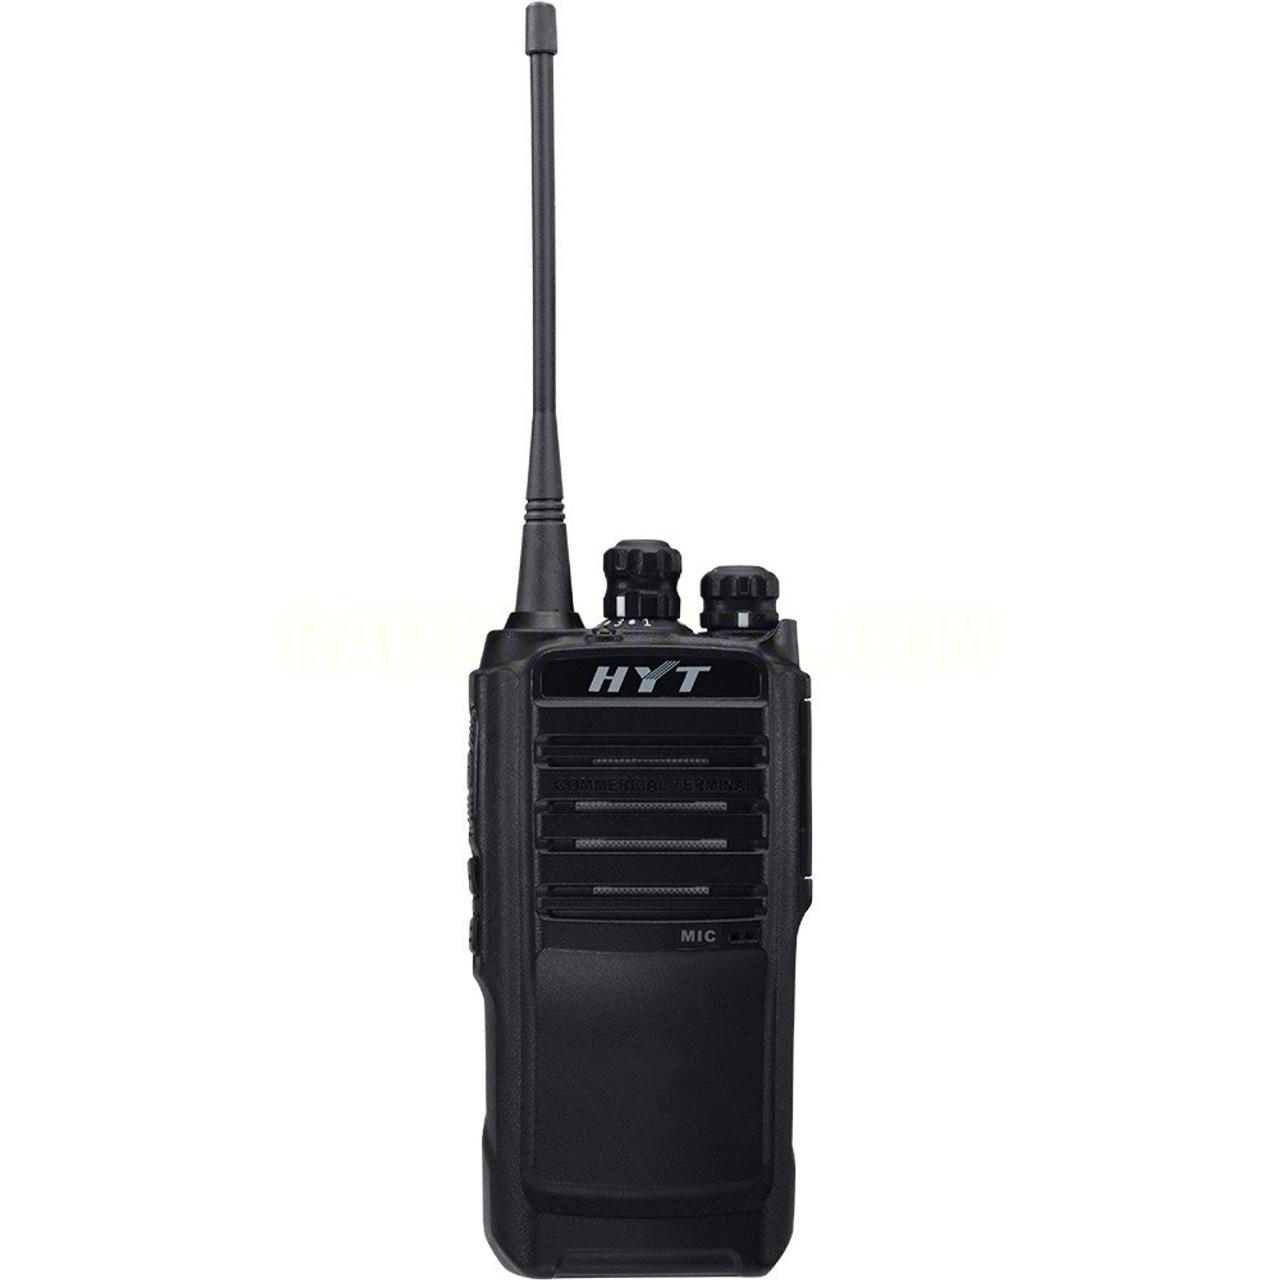 Hyt Tc 508 Analog Portable Radio Two Way Direct